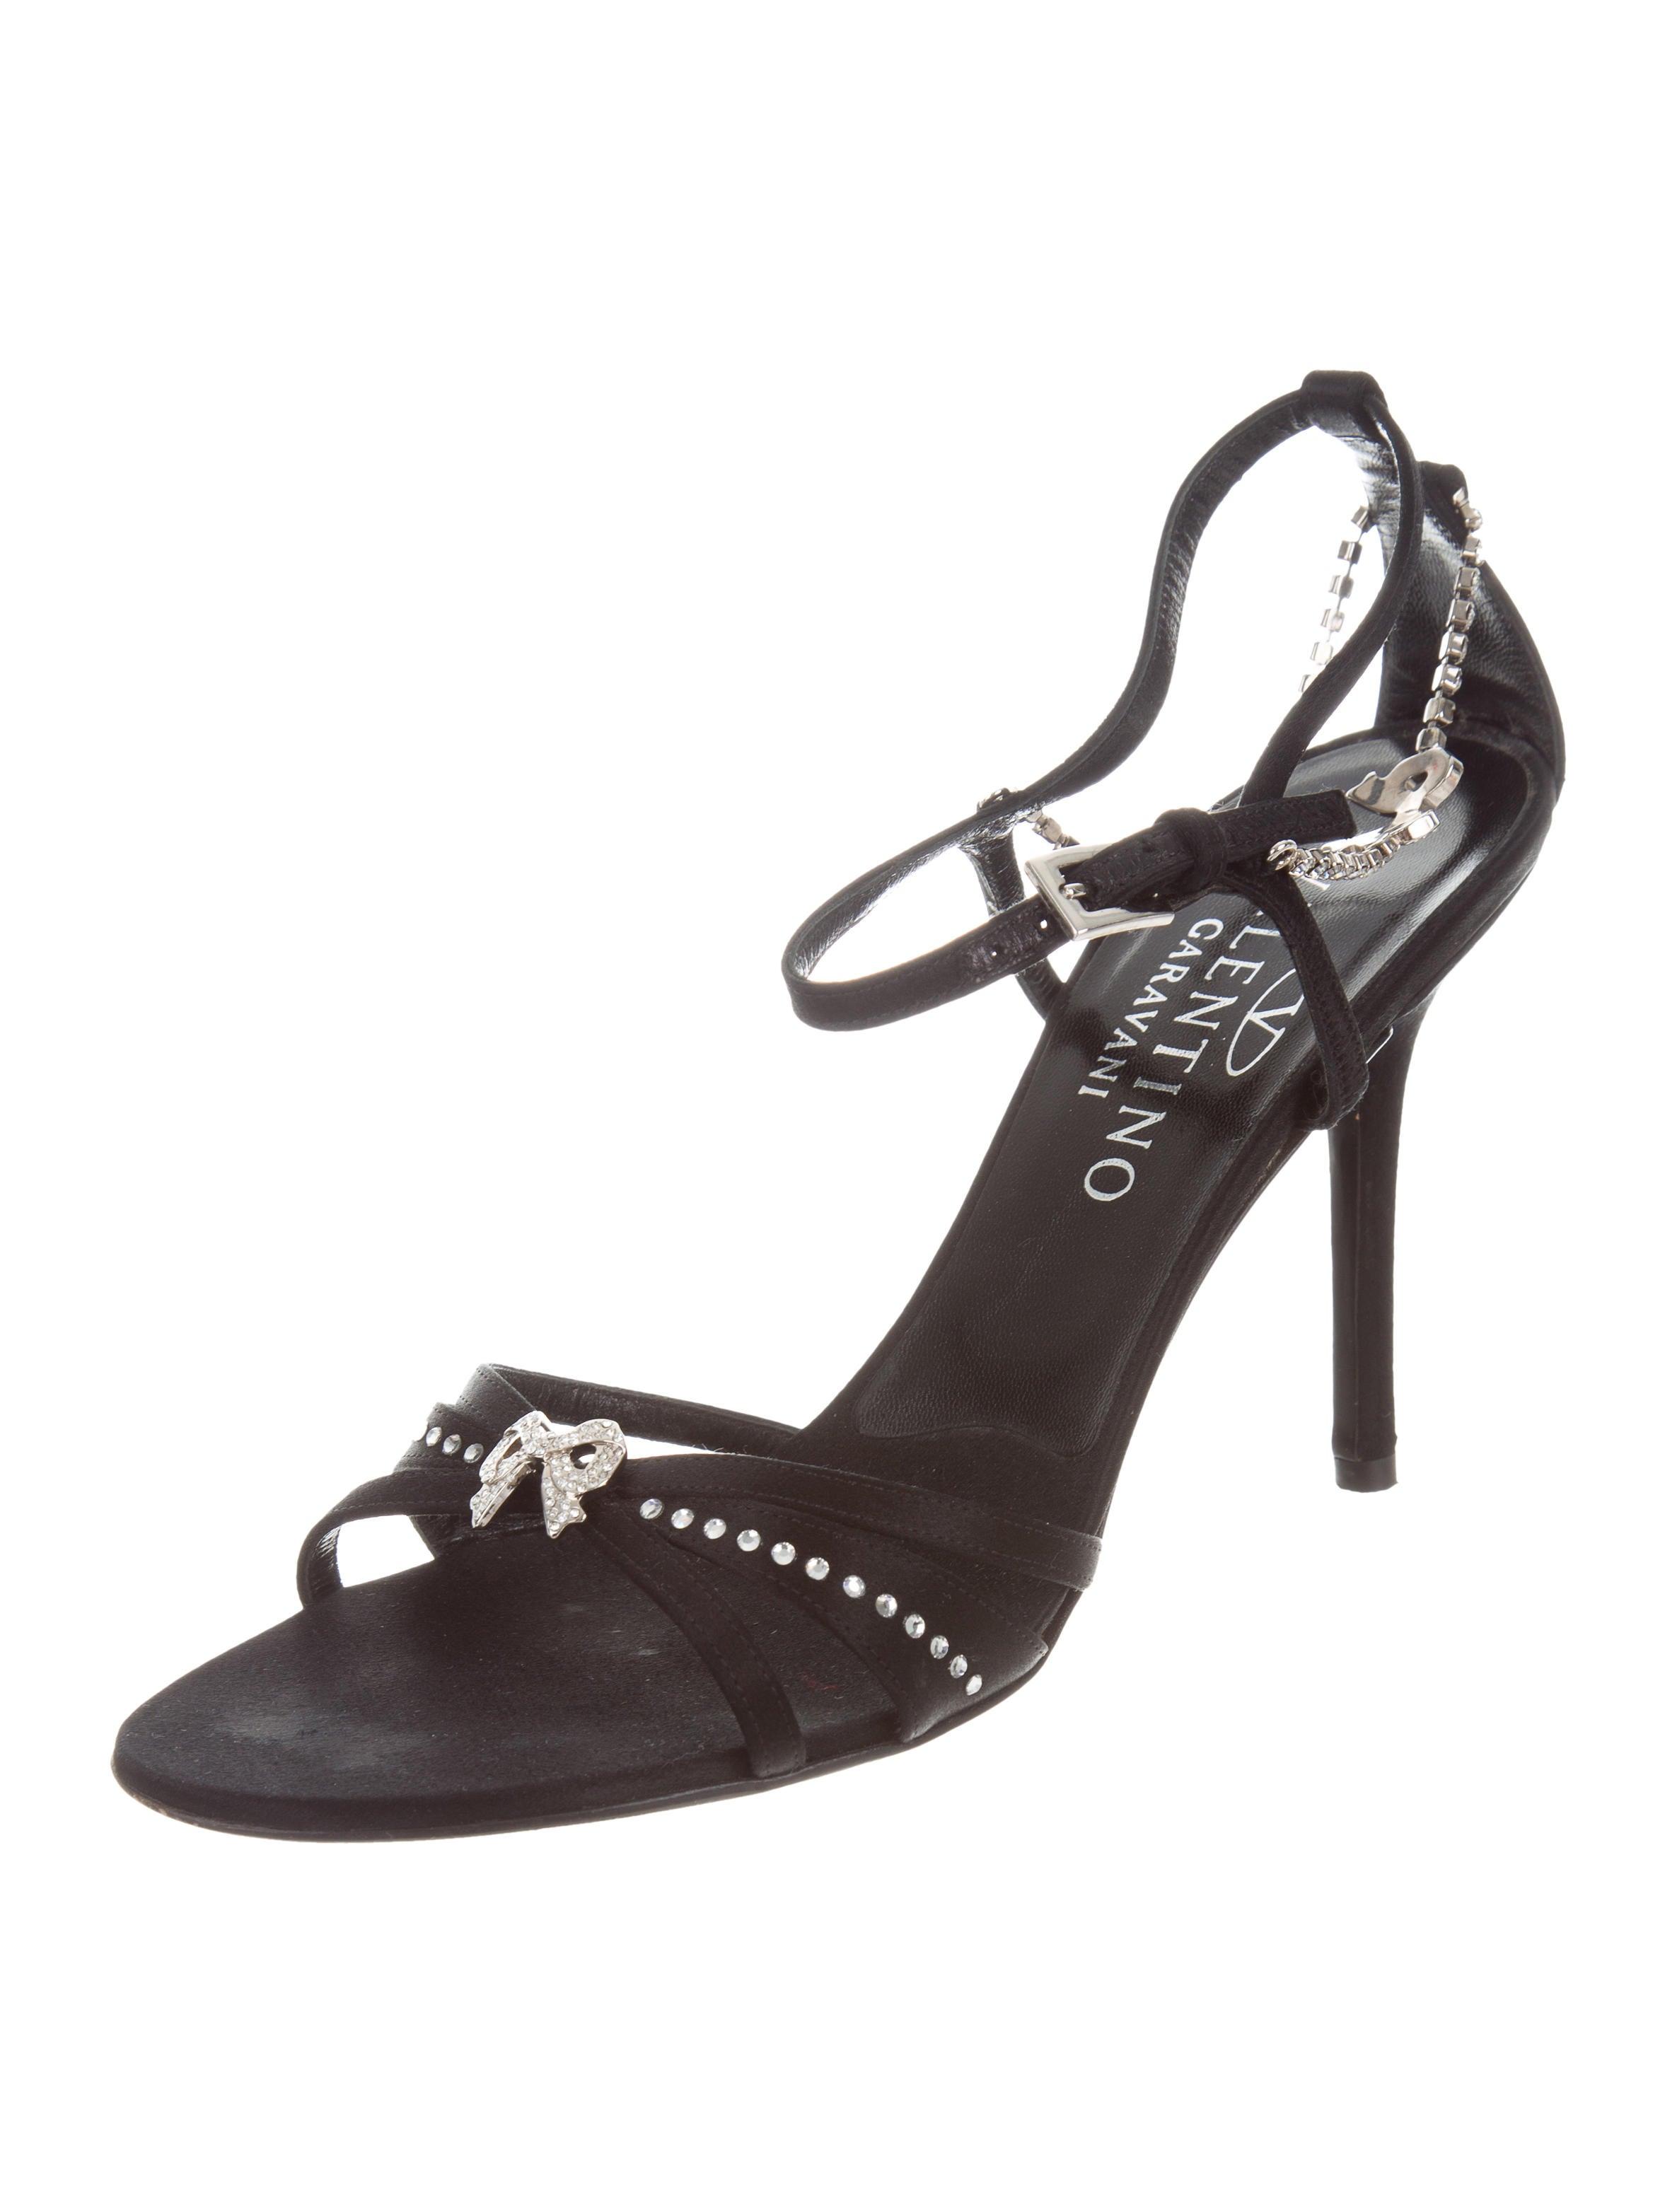 Valentino Satin Jewel-Embellished Sandals cheap sale for cheap M1lJoCVgsY